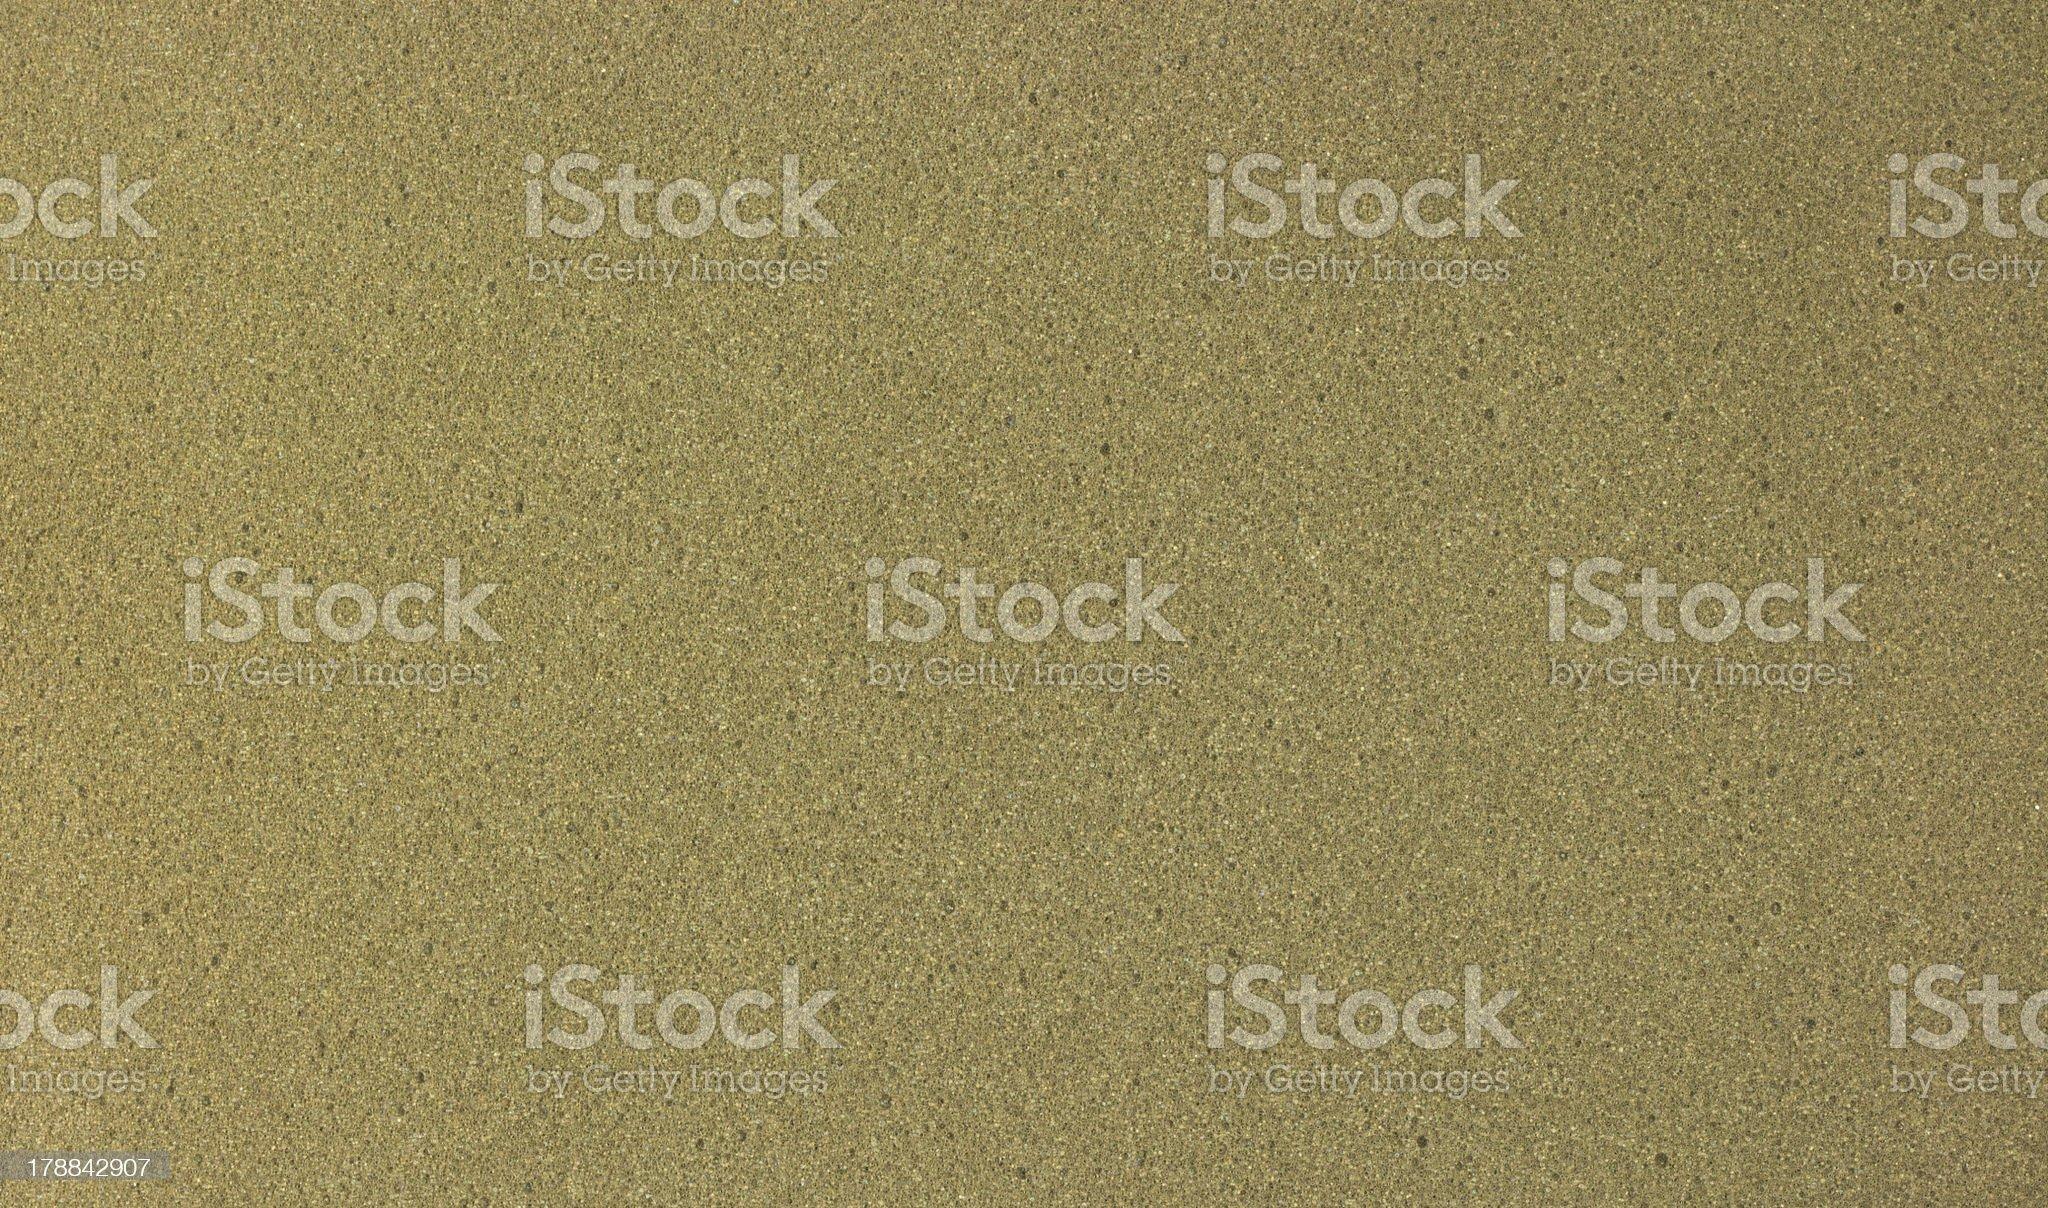 Warm Foam Texture royalty-free stock photo